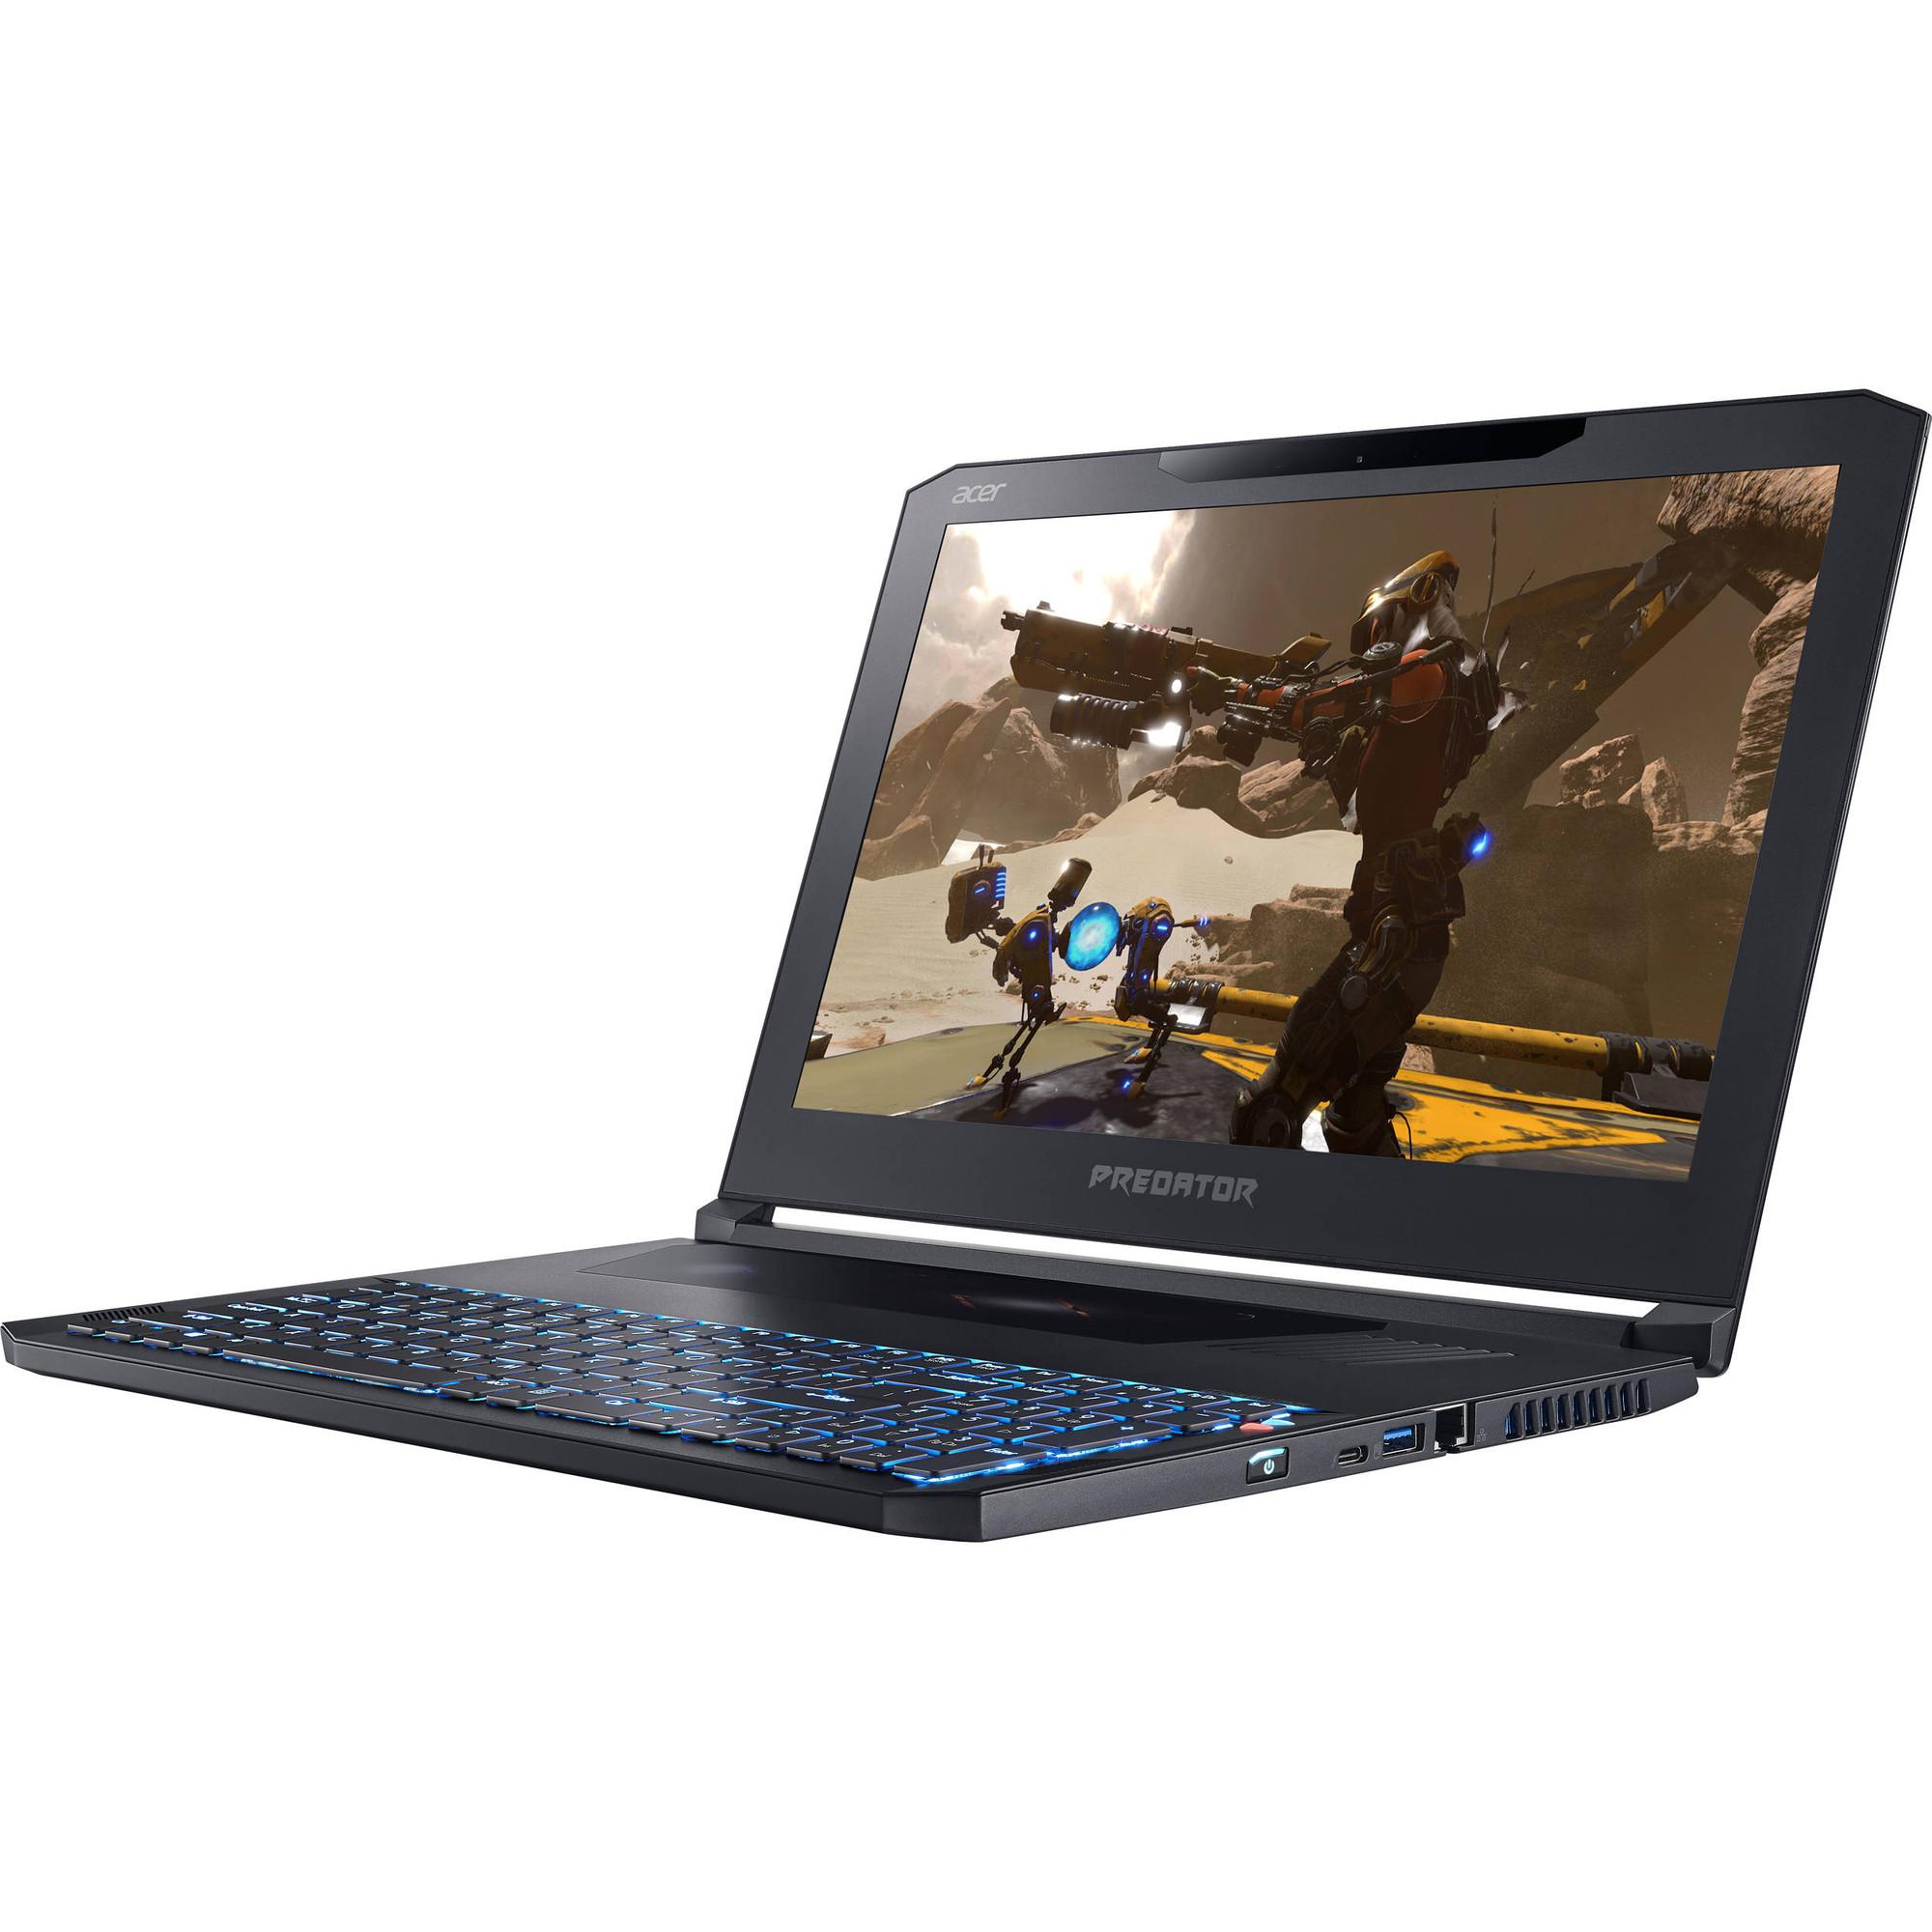 Acer Predator Triton 700 - 15 6